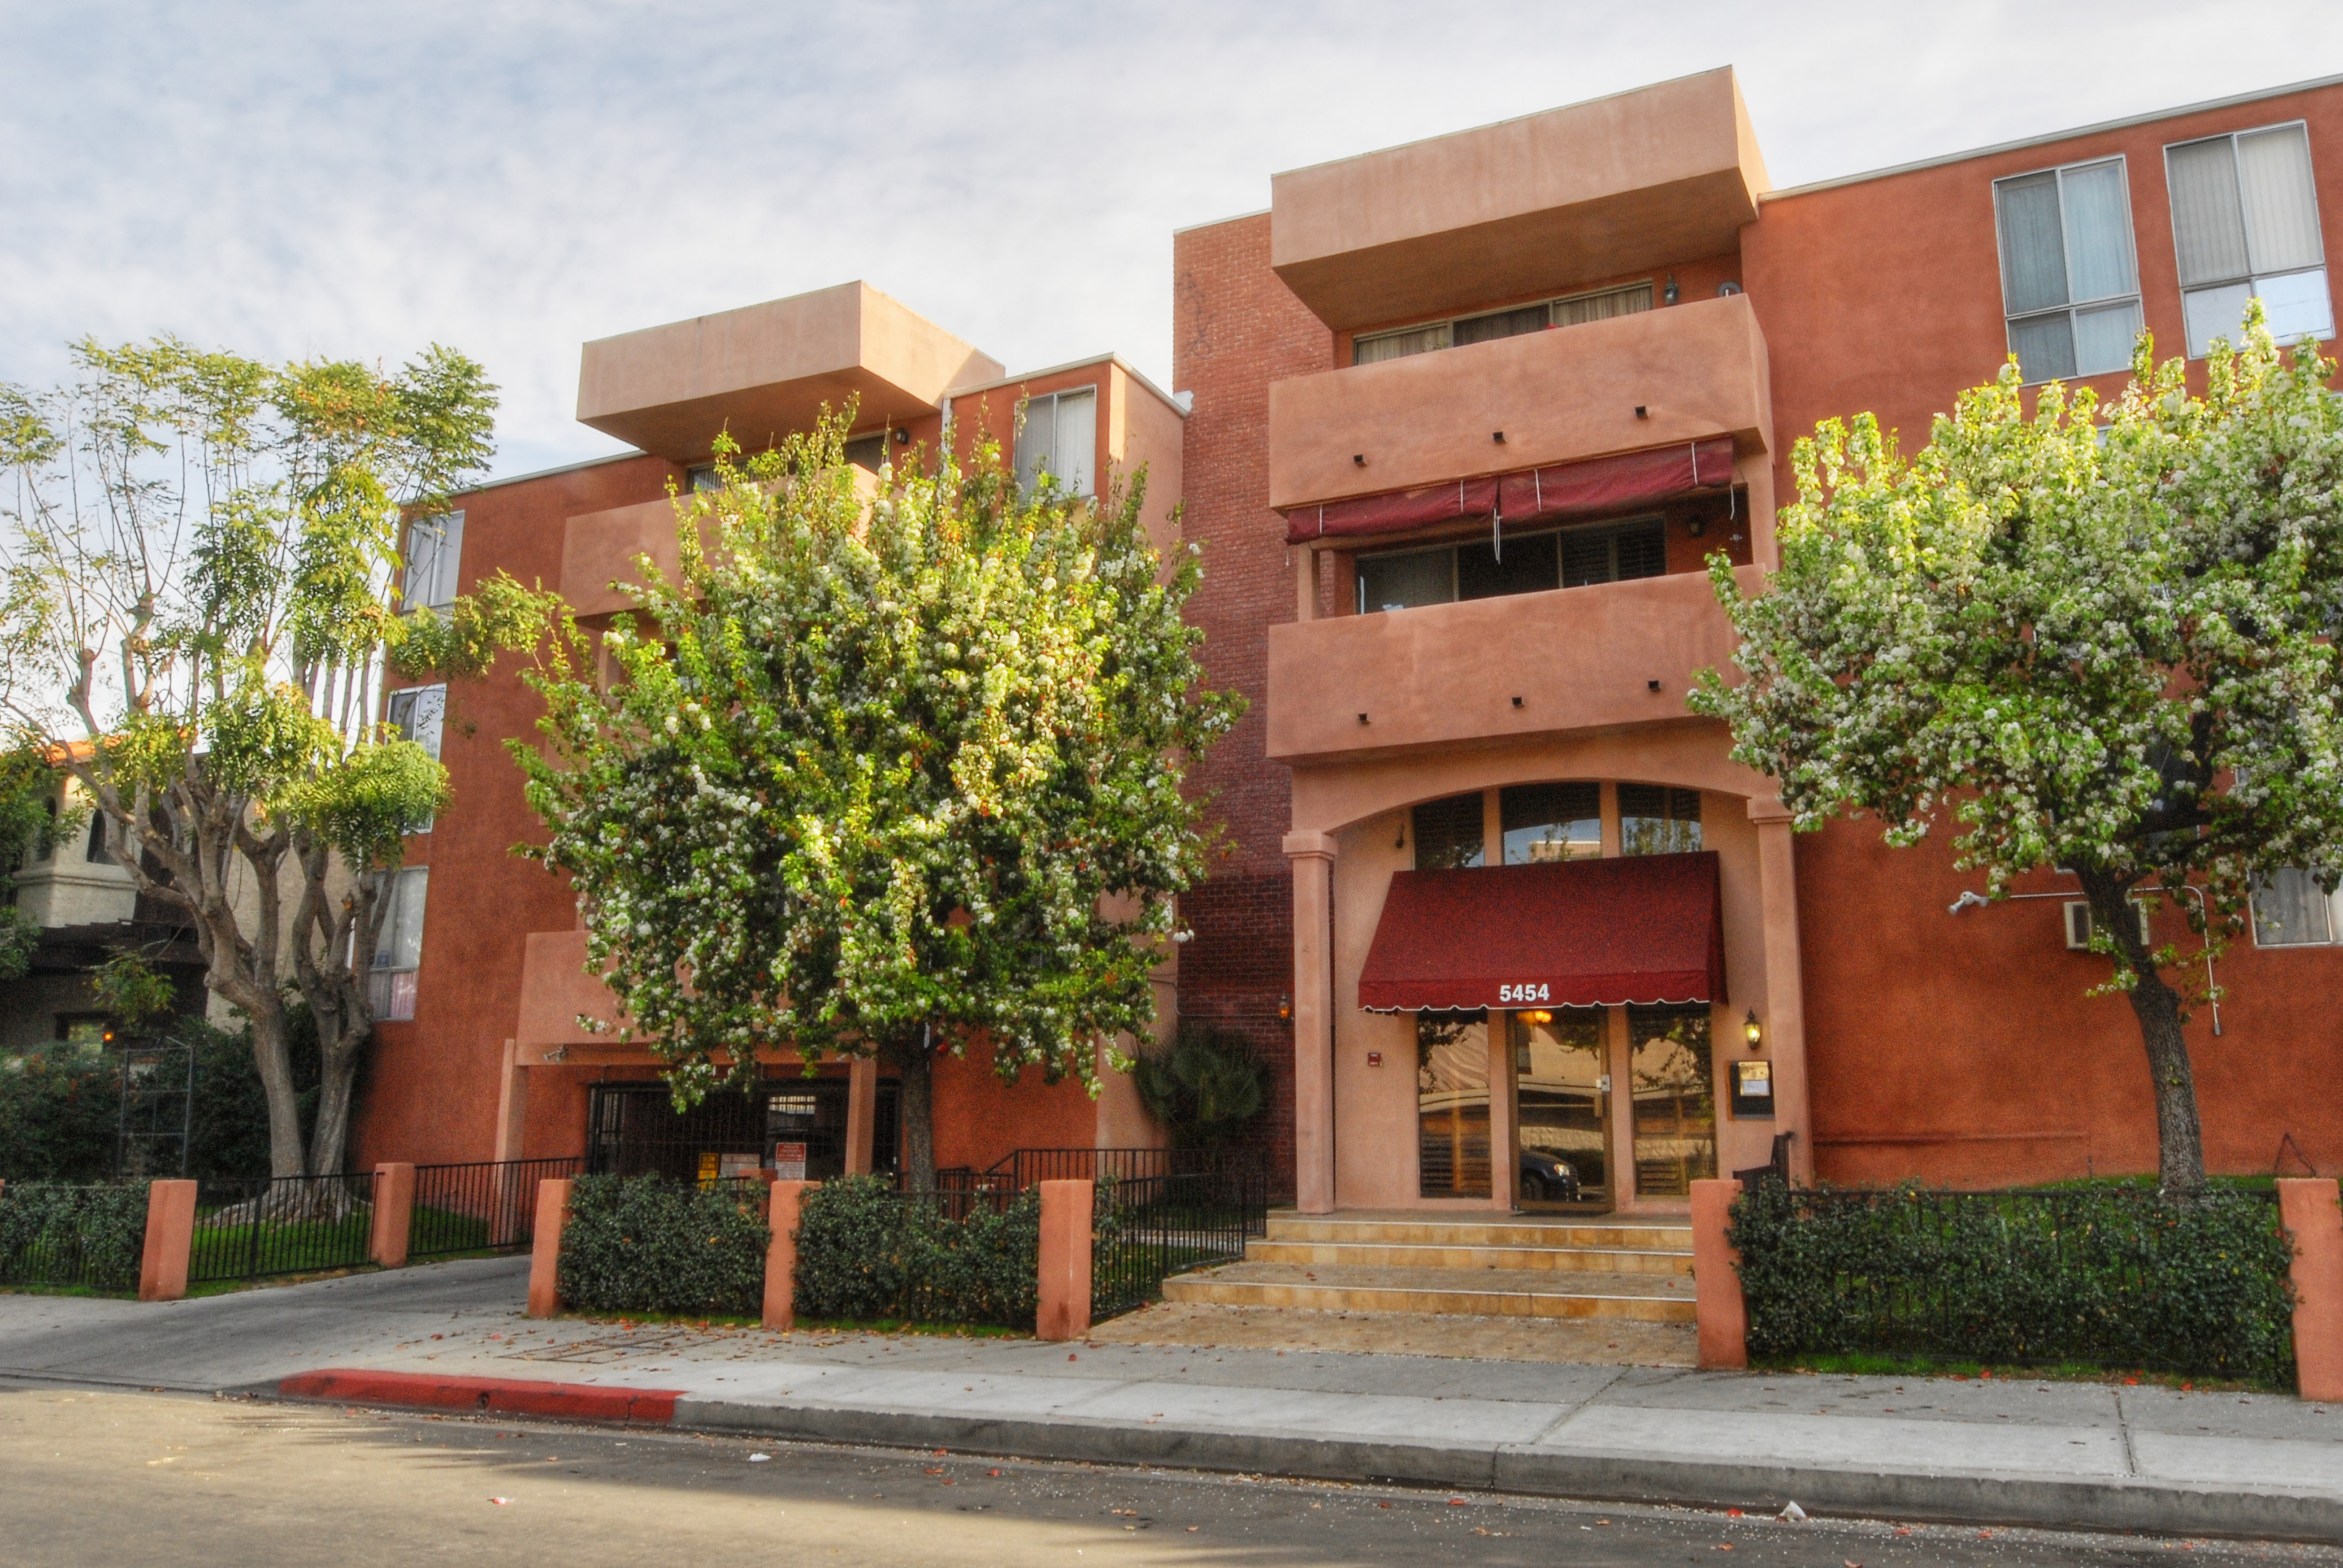 Properties sold by Victoria Cruz-Christian